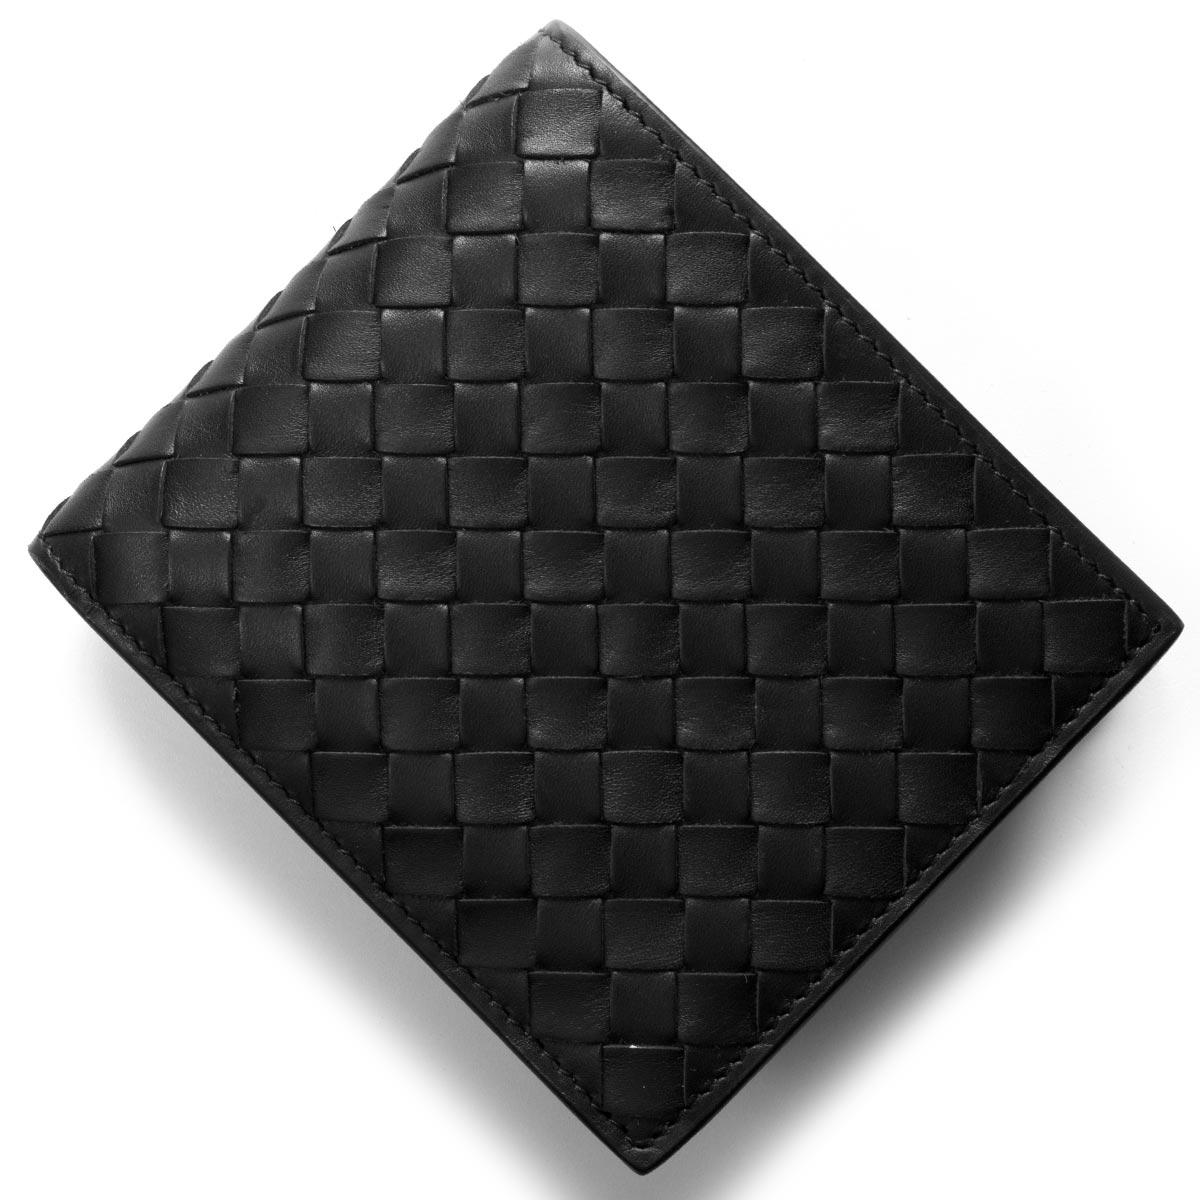 97706b7de568 ボッテガヴェネタ BOTTEGA VENETA. 二つ折り財布 イントレチャート/INTRECCIATO ブラック 415892 V4651 1000  メンズ